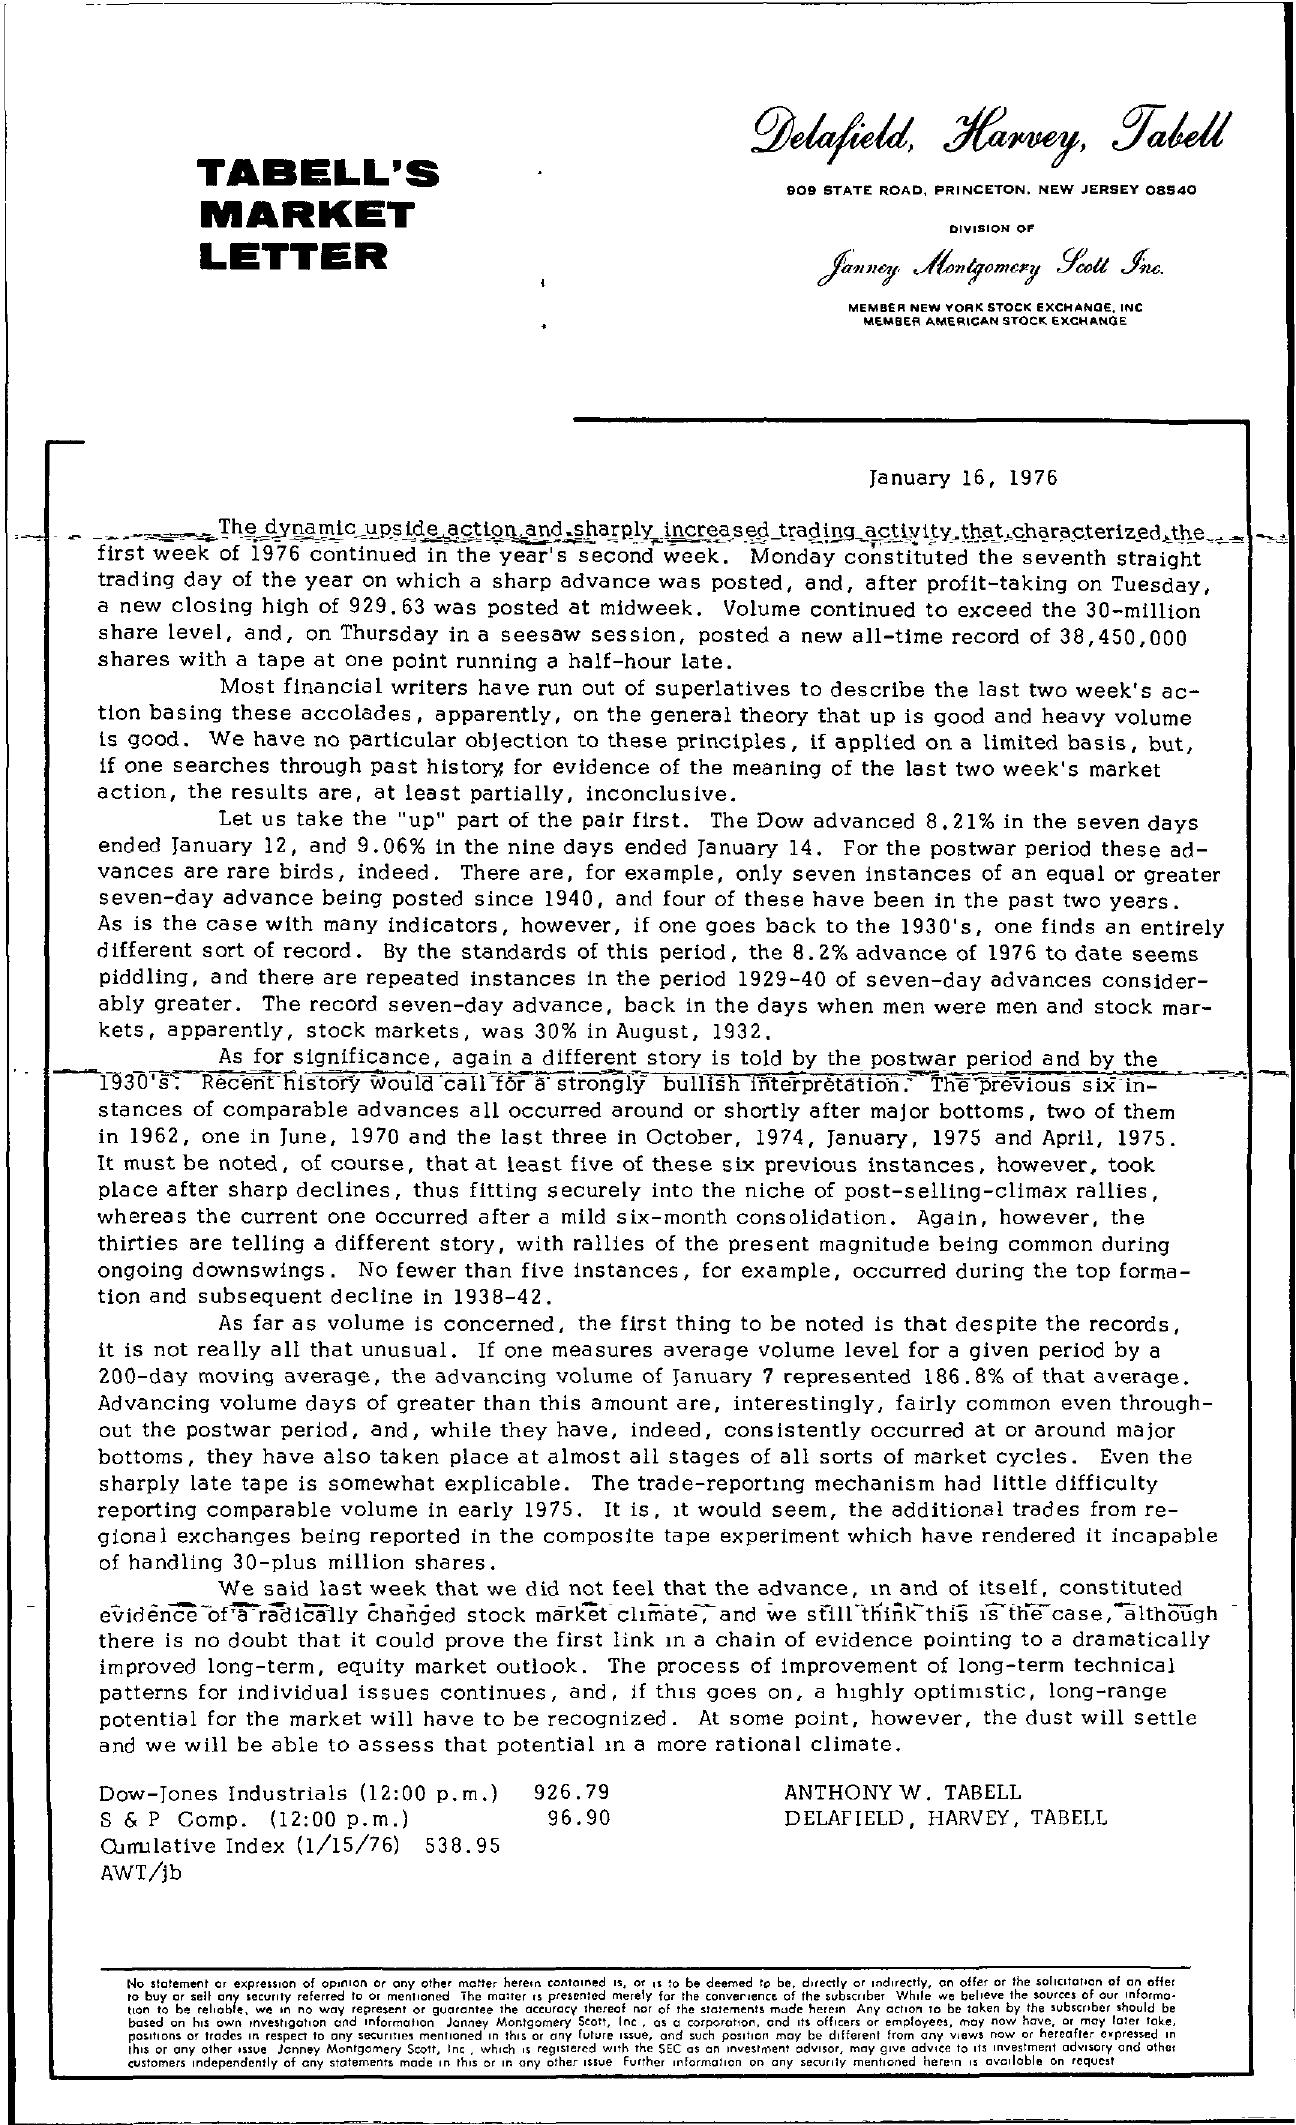 Tabell's Market Letter - January 16, 1976